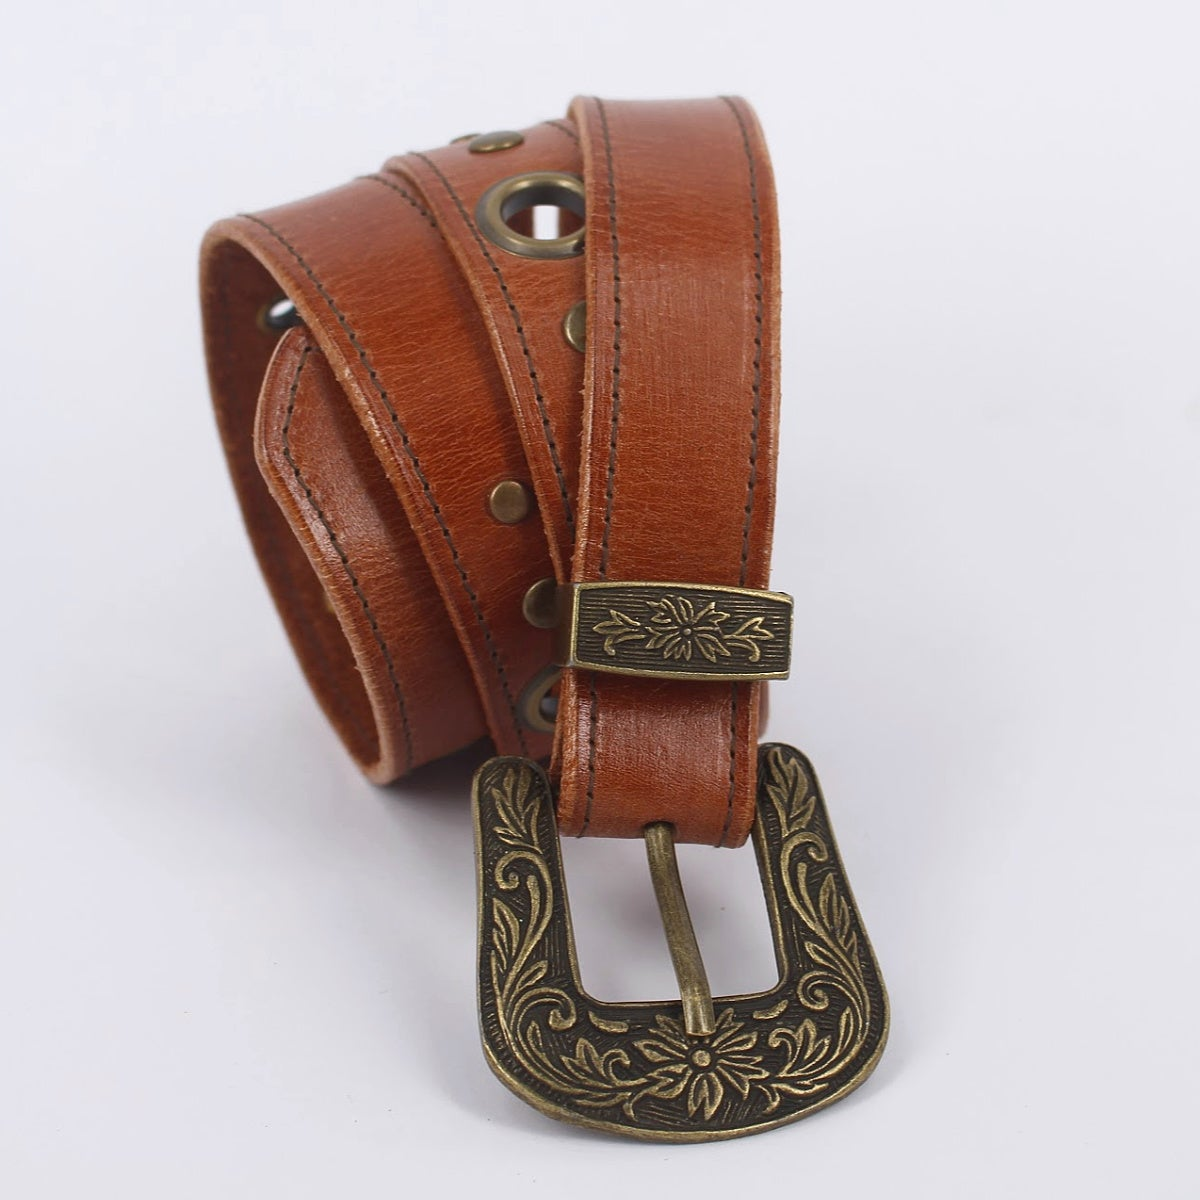 Image of Leather Boho Belt - Small Tan